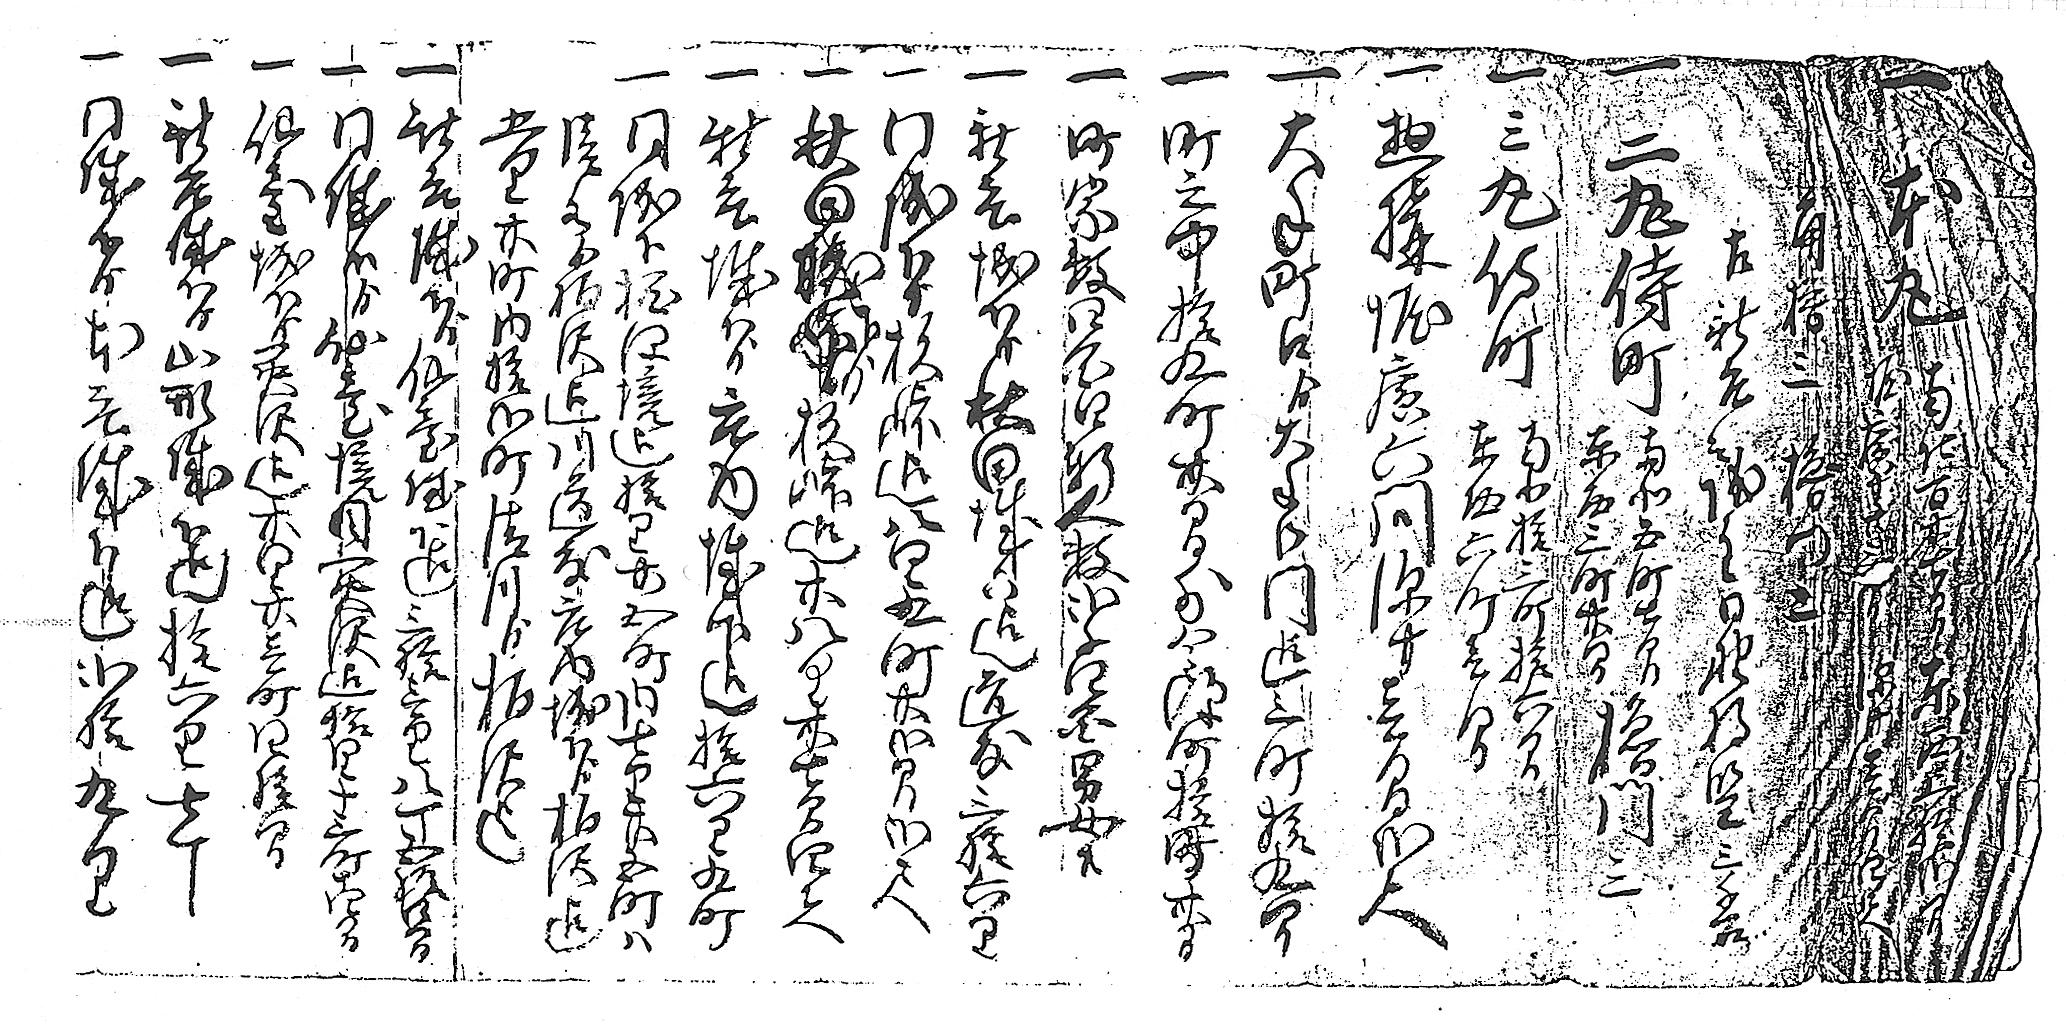 新庄城の規模(井関家文書)